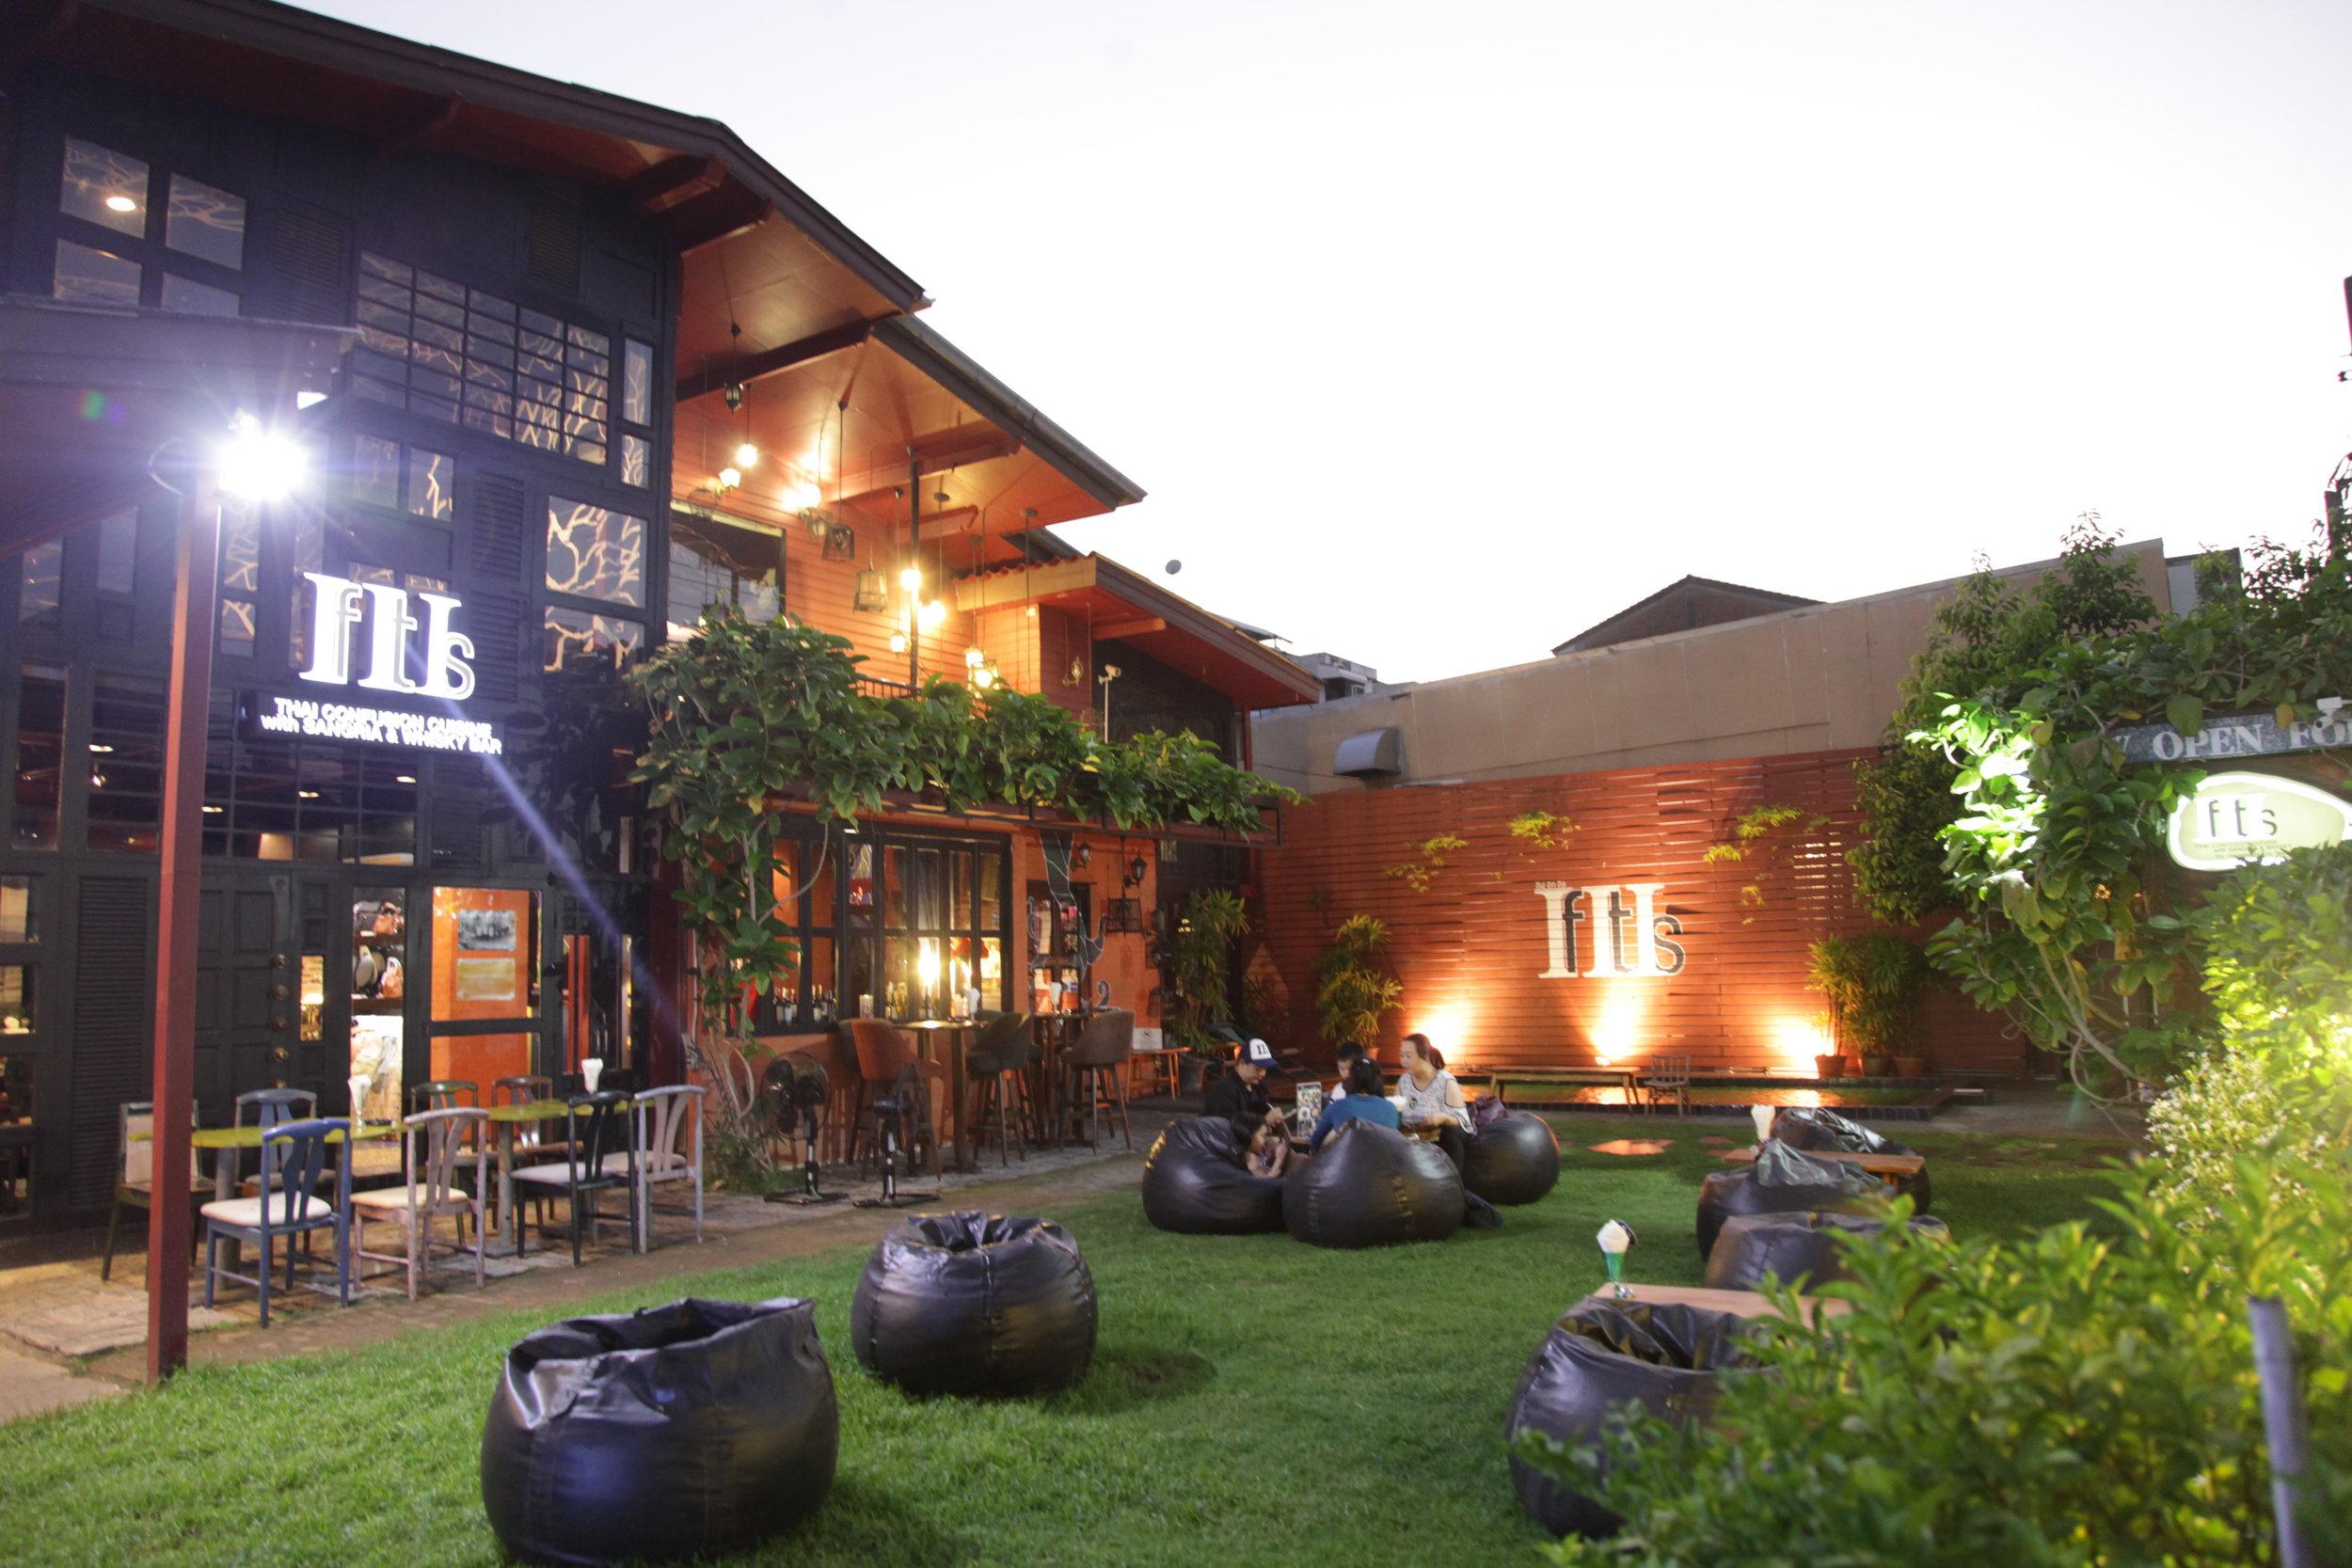 "Garden & Pool: - Garden & Pool:""สนามหญ้าและสระน้ํา"" สนามหญ้าสีเขียว ที่เชื้อเชิญให้คนรักสัตว์พาลูกๆ สุนัข แมว และสัตว์เลี้ยงมาวิ่งเล่น ifitis ทองหล่อ 23 จึงถือได้เป็น pet friendly restaurant นอกจากนี้ เหล่าคอเบียร์ก็สามารถมาจิบเบียร์ เพราะเป็นร้านนั่งชิว บรรยากาศดี ส่วนสระว่ายน้ํานี้ก็เป็นสถานที่จัด pool party หรือเล่นเกมสนุกๆได้ไม่จํากัด เพศและวัยเลย"